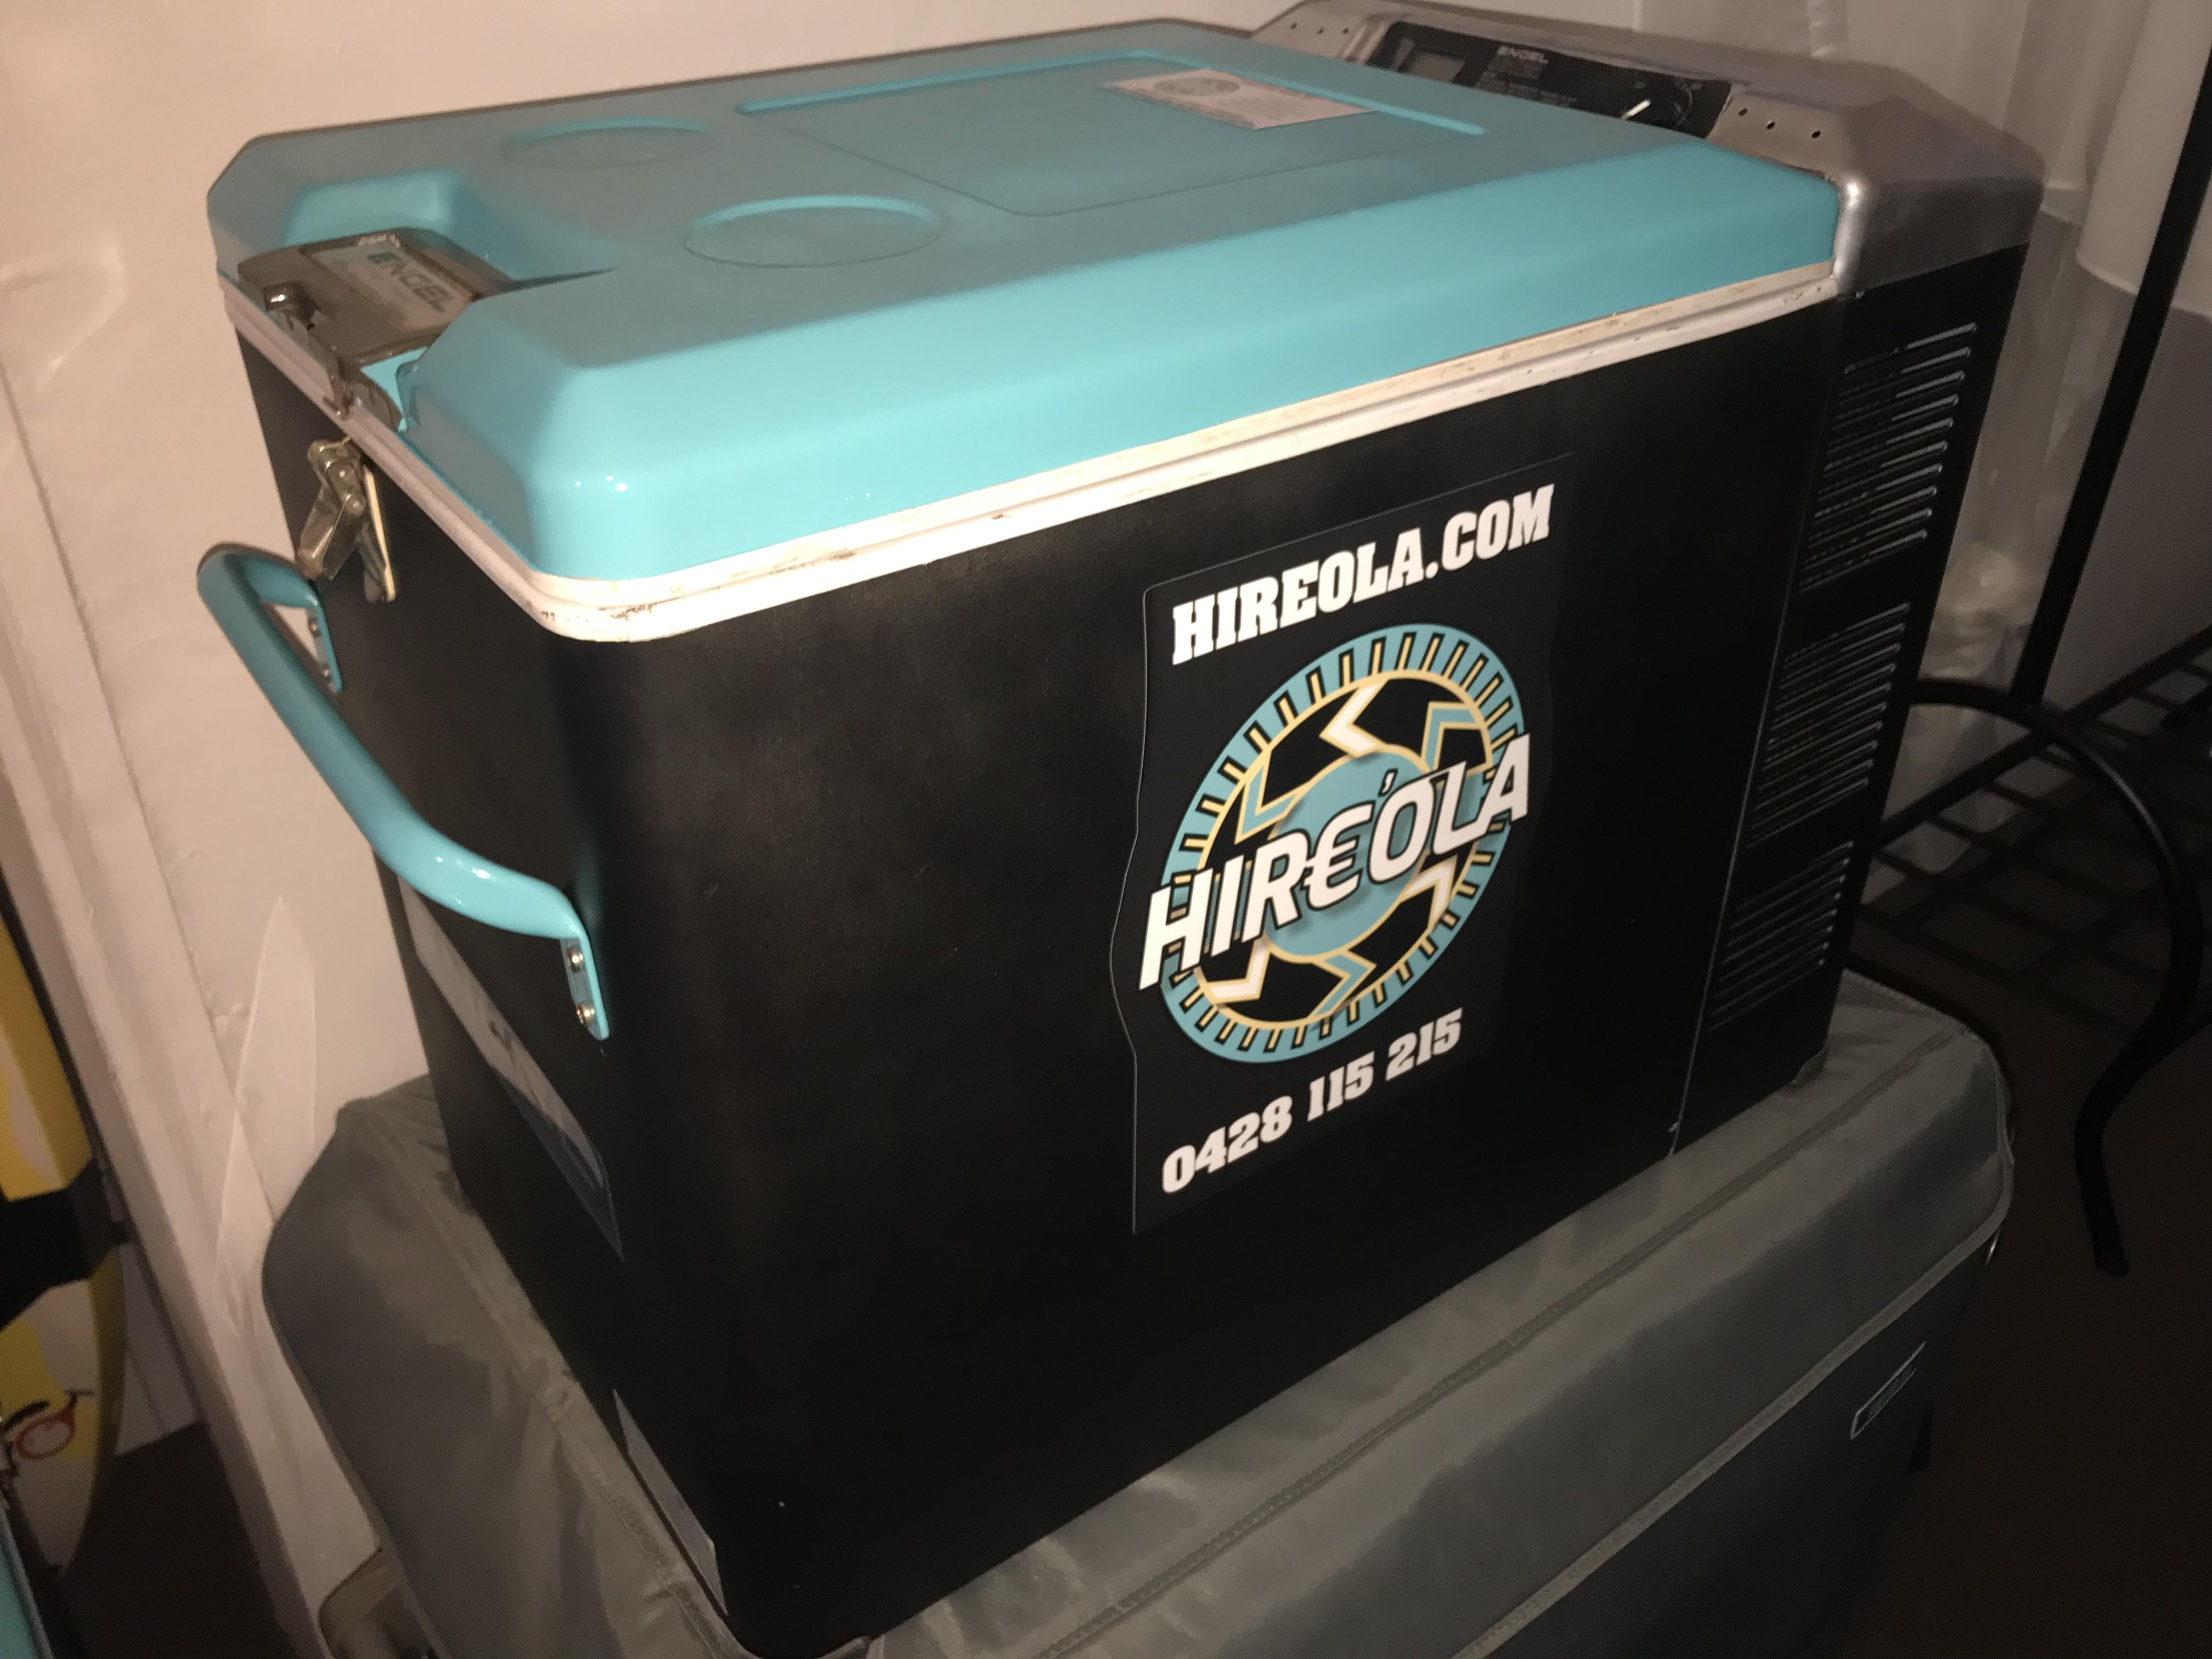 40Lt Engel Fridge Freezer  2 Week Promo